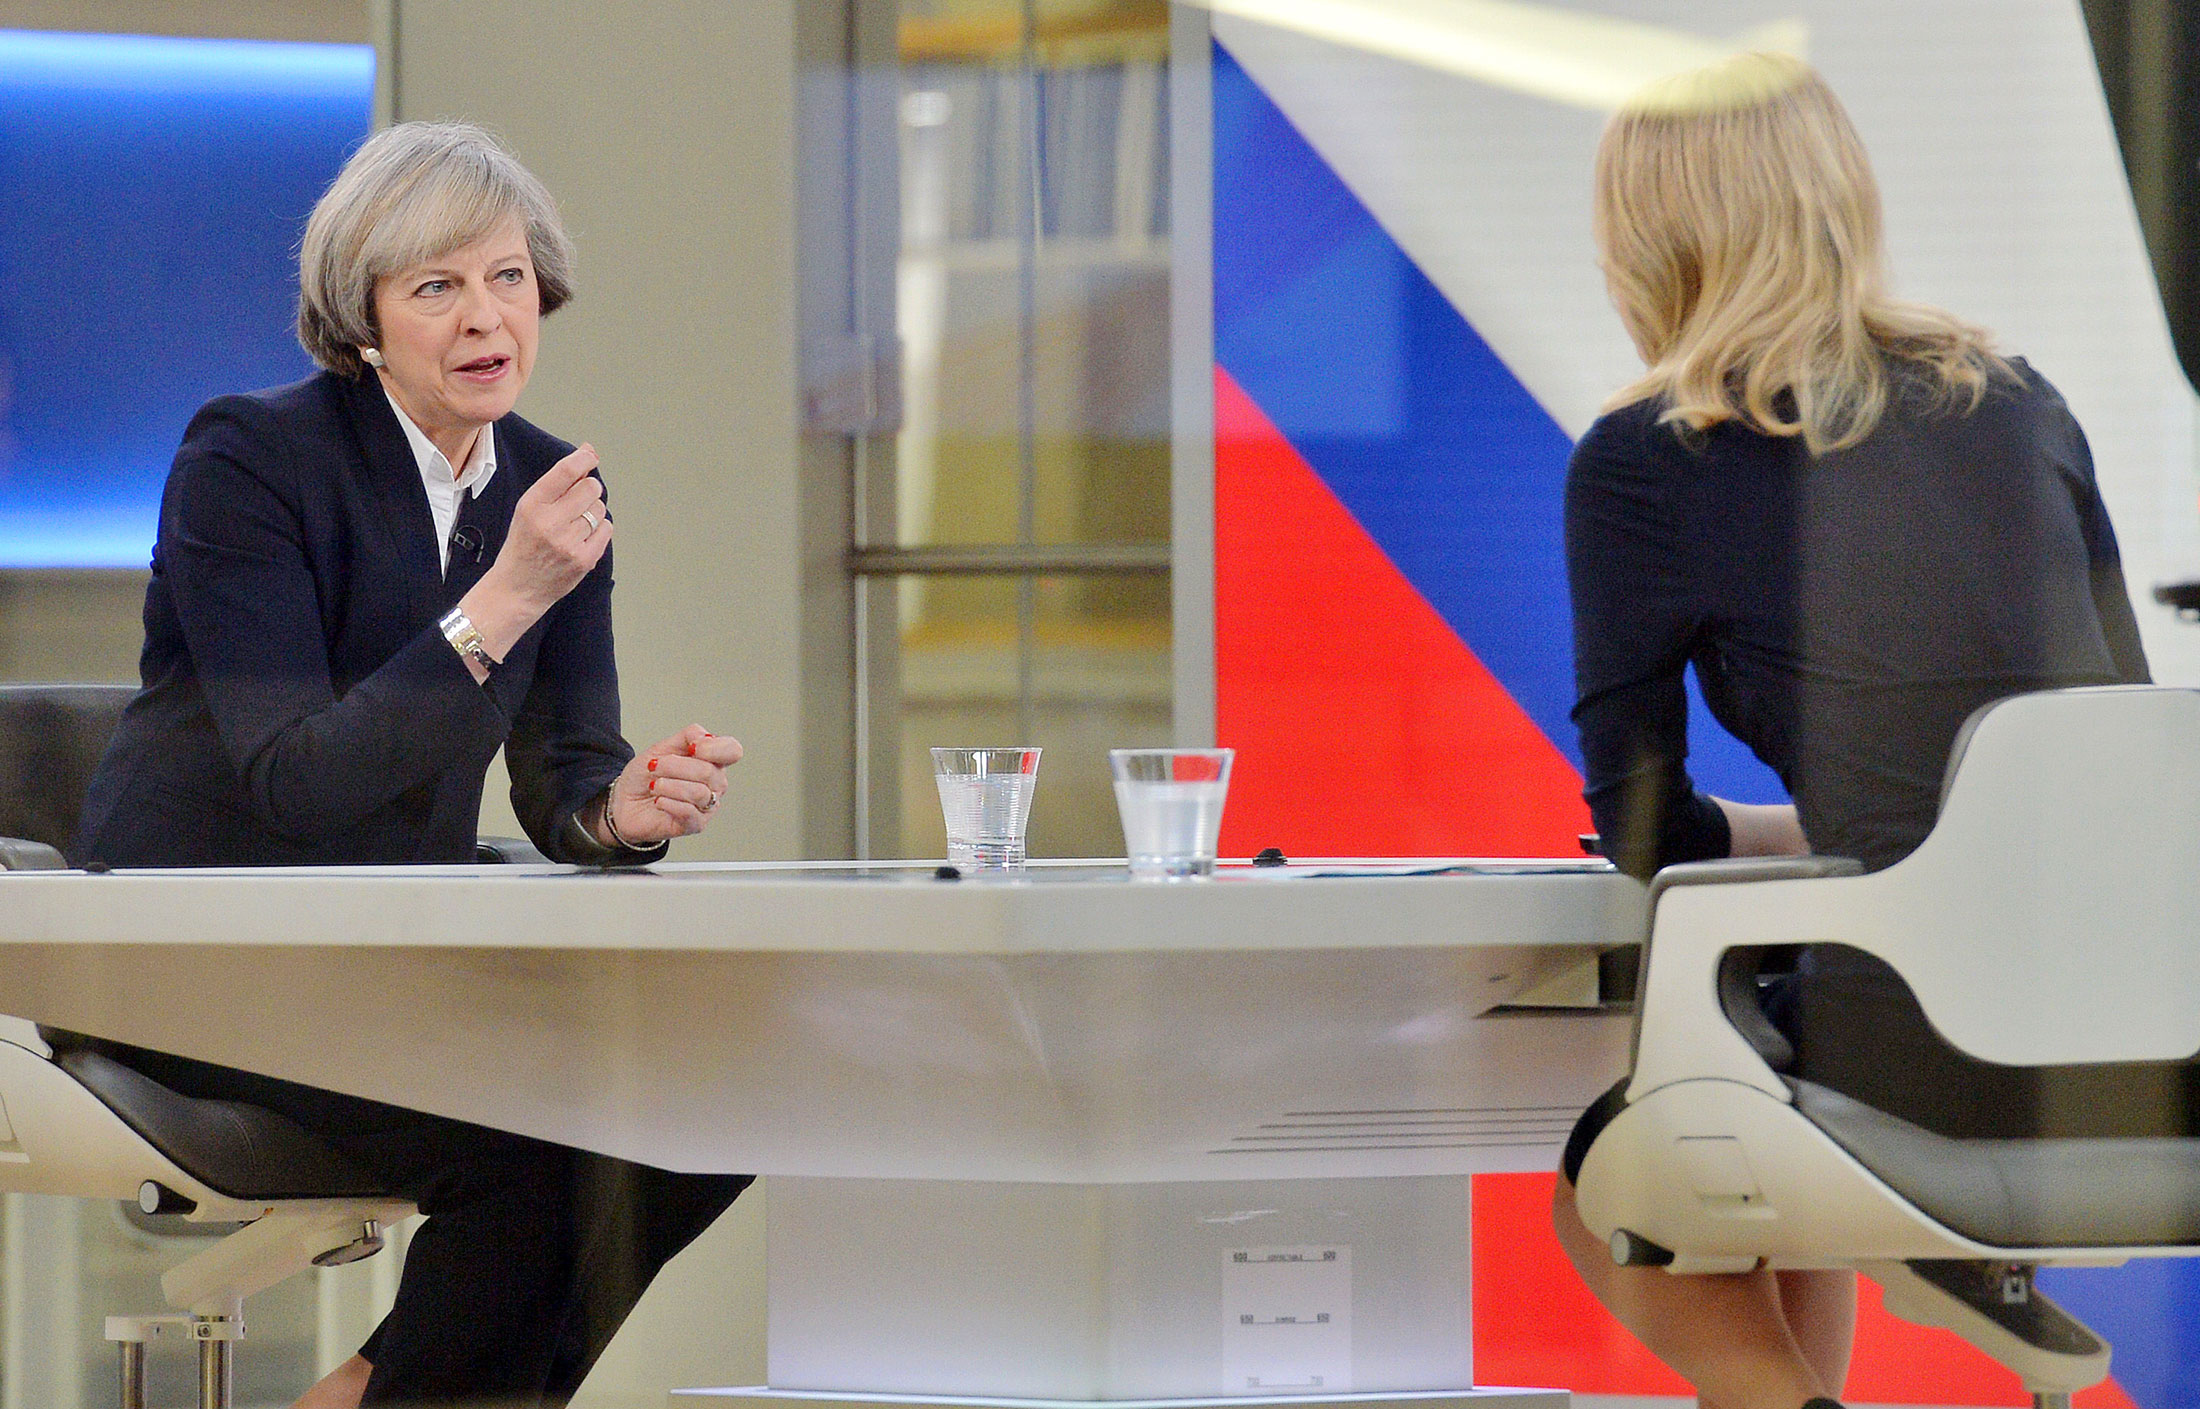 Brexit Bulletin: Theresa May Drops Single Market Exit Hint